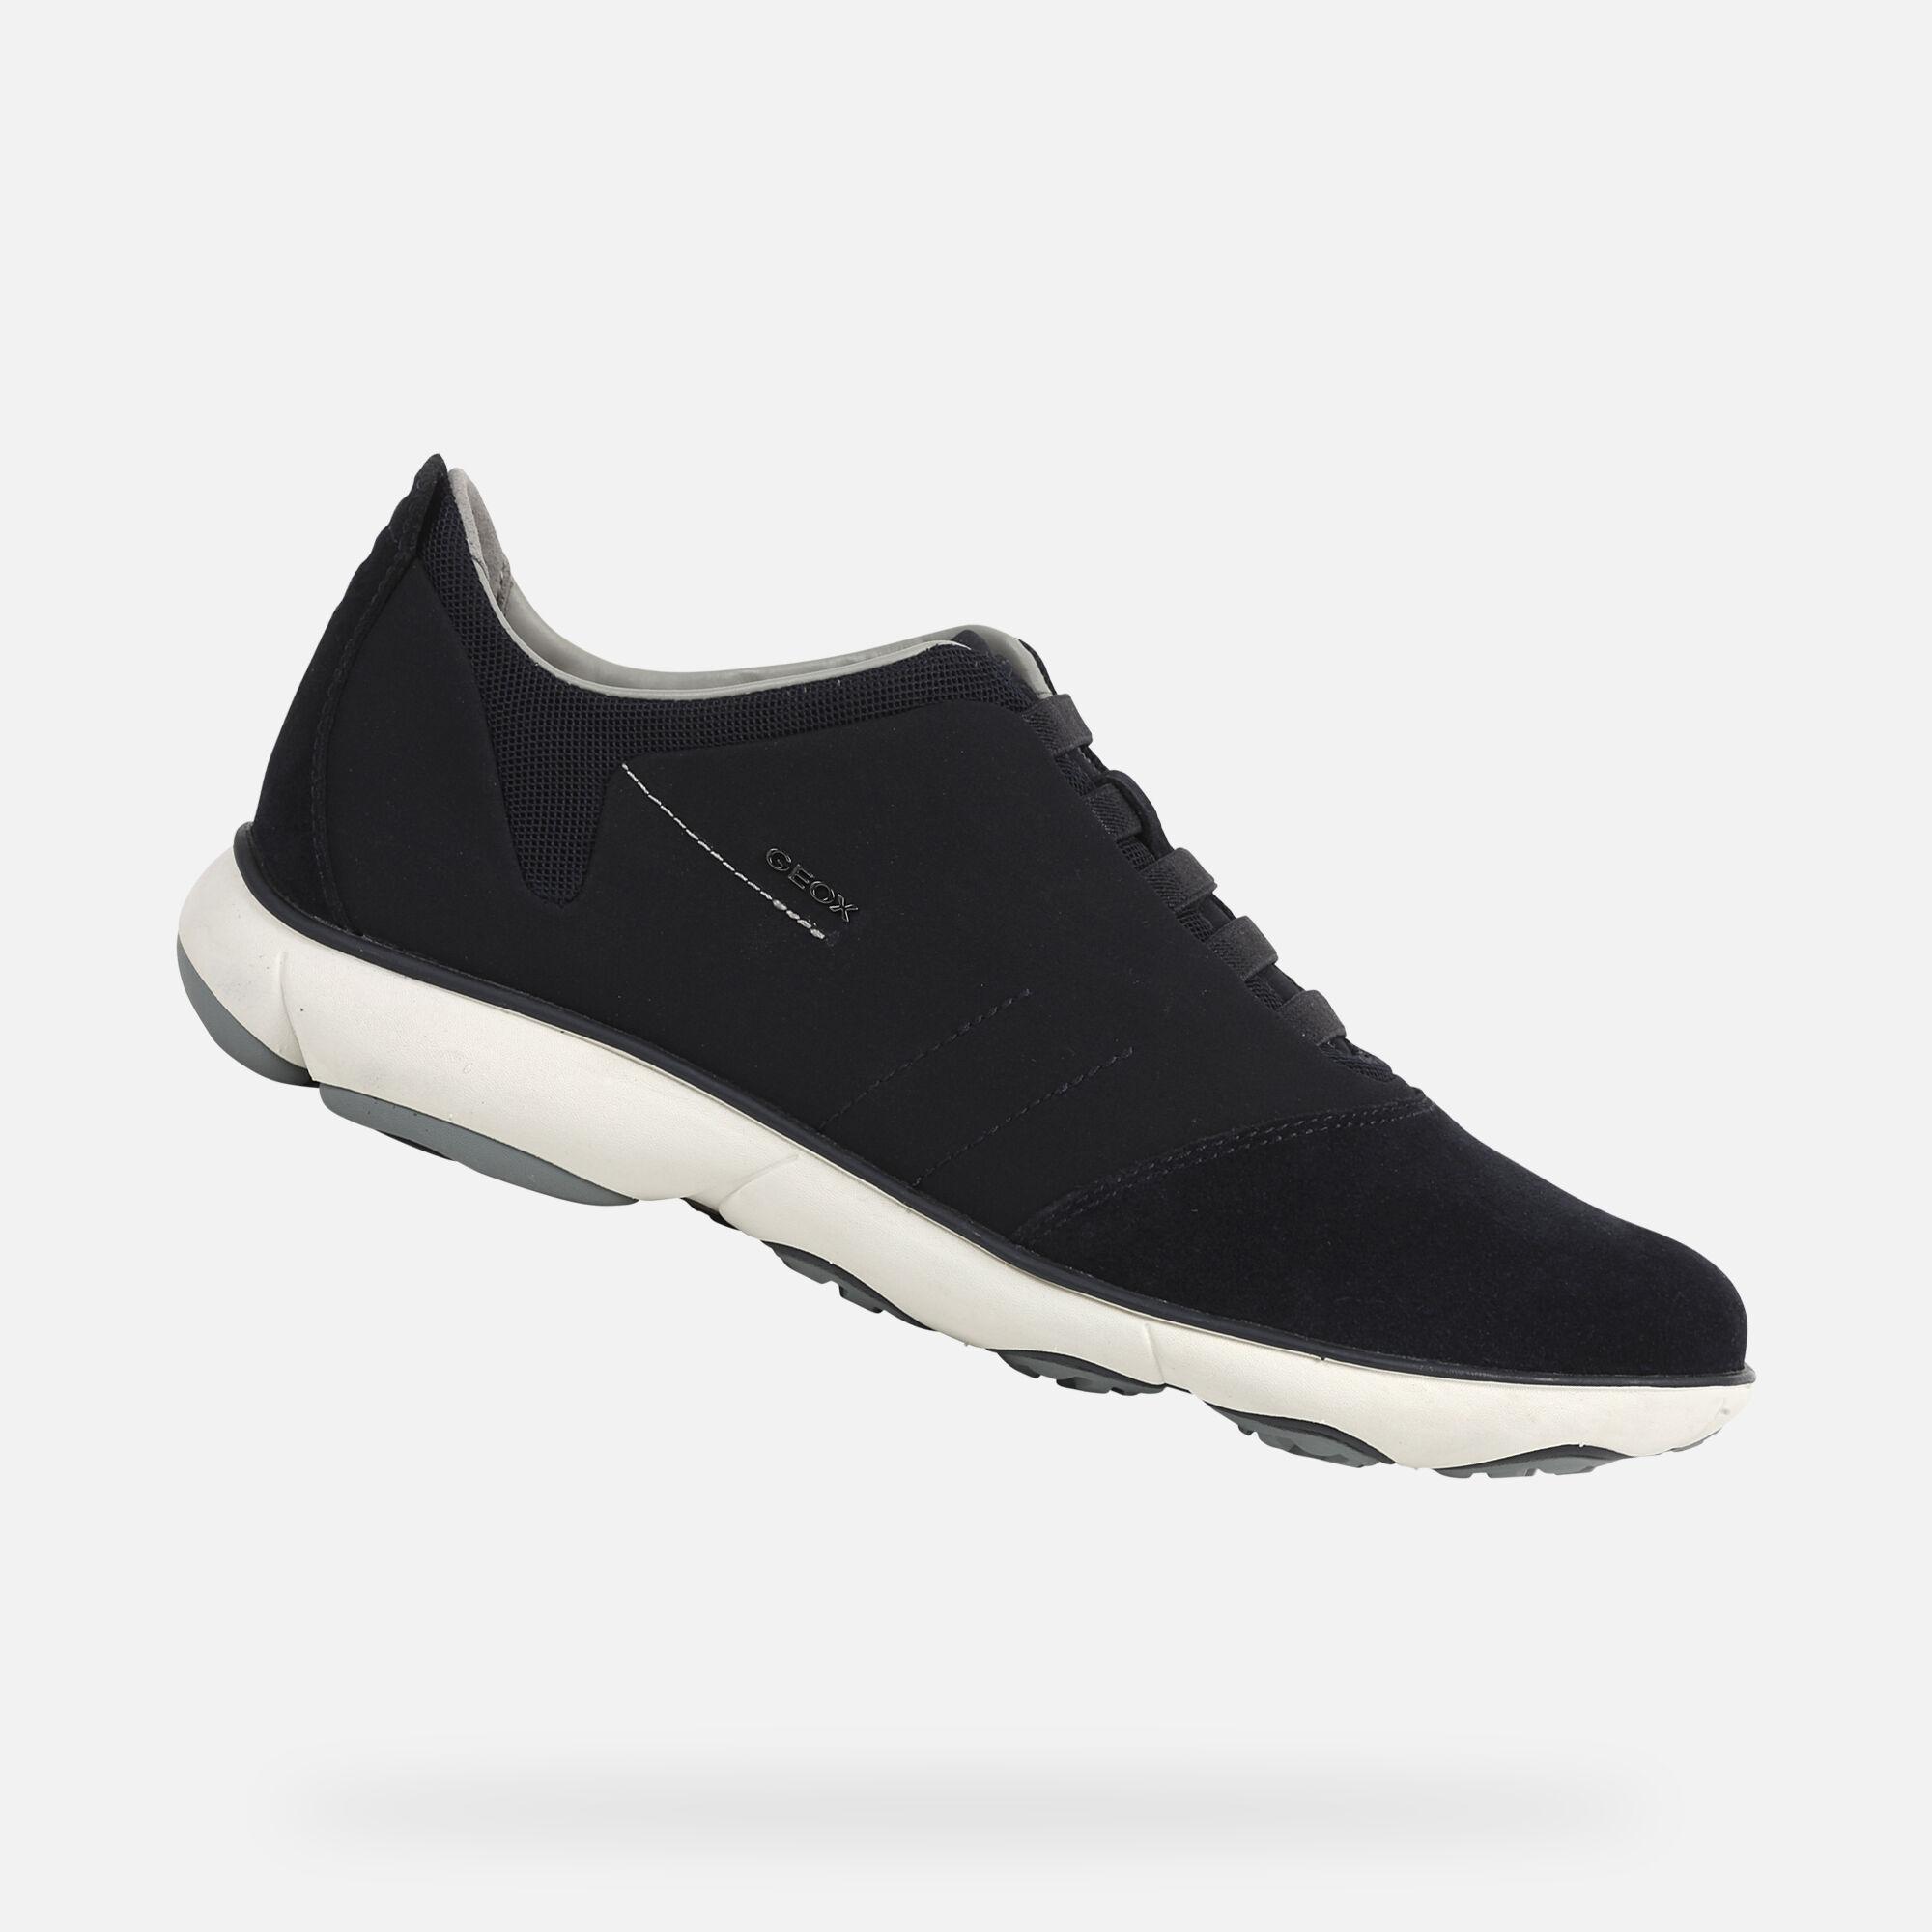 geox shoes usa outlet, geox respira nebula b slipper dark